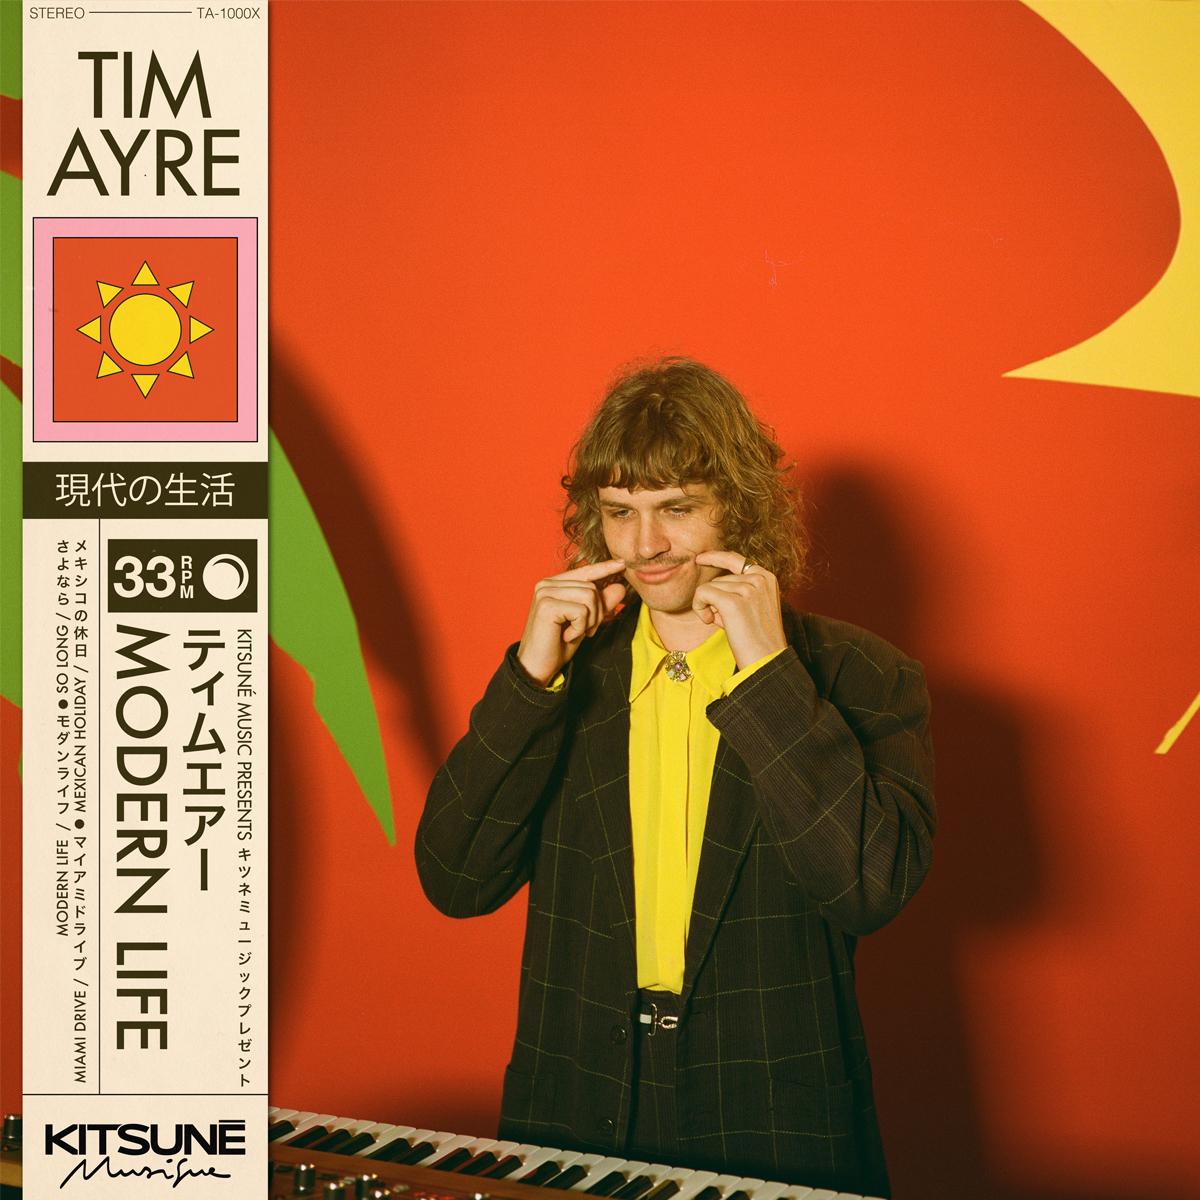 Tim Ayre Modern Life EP 2021